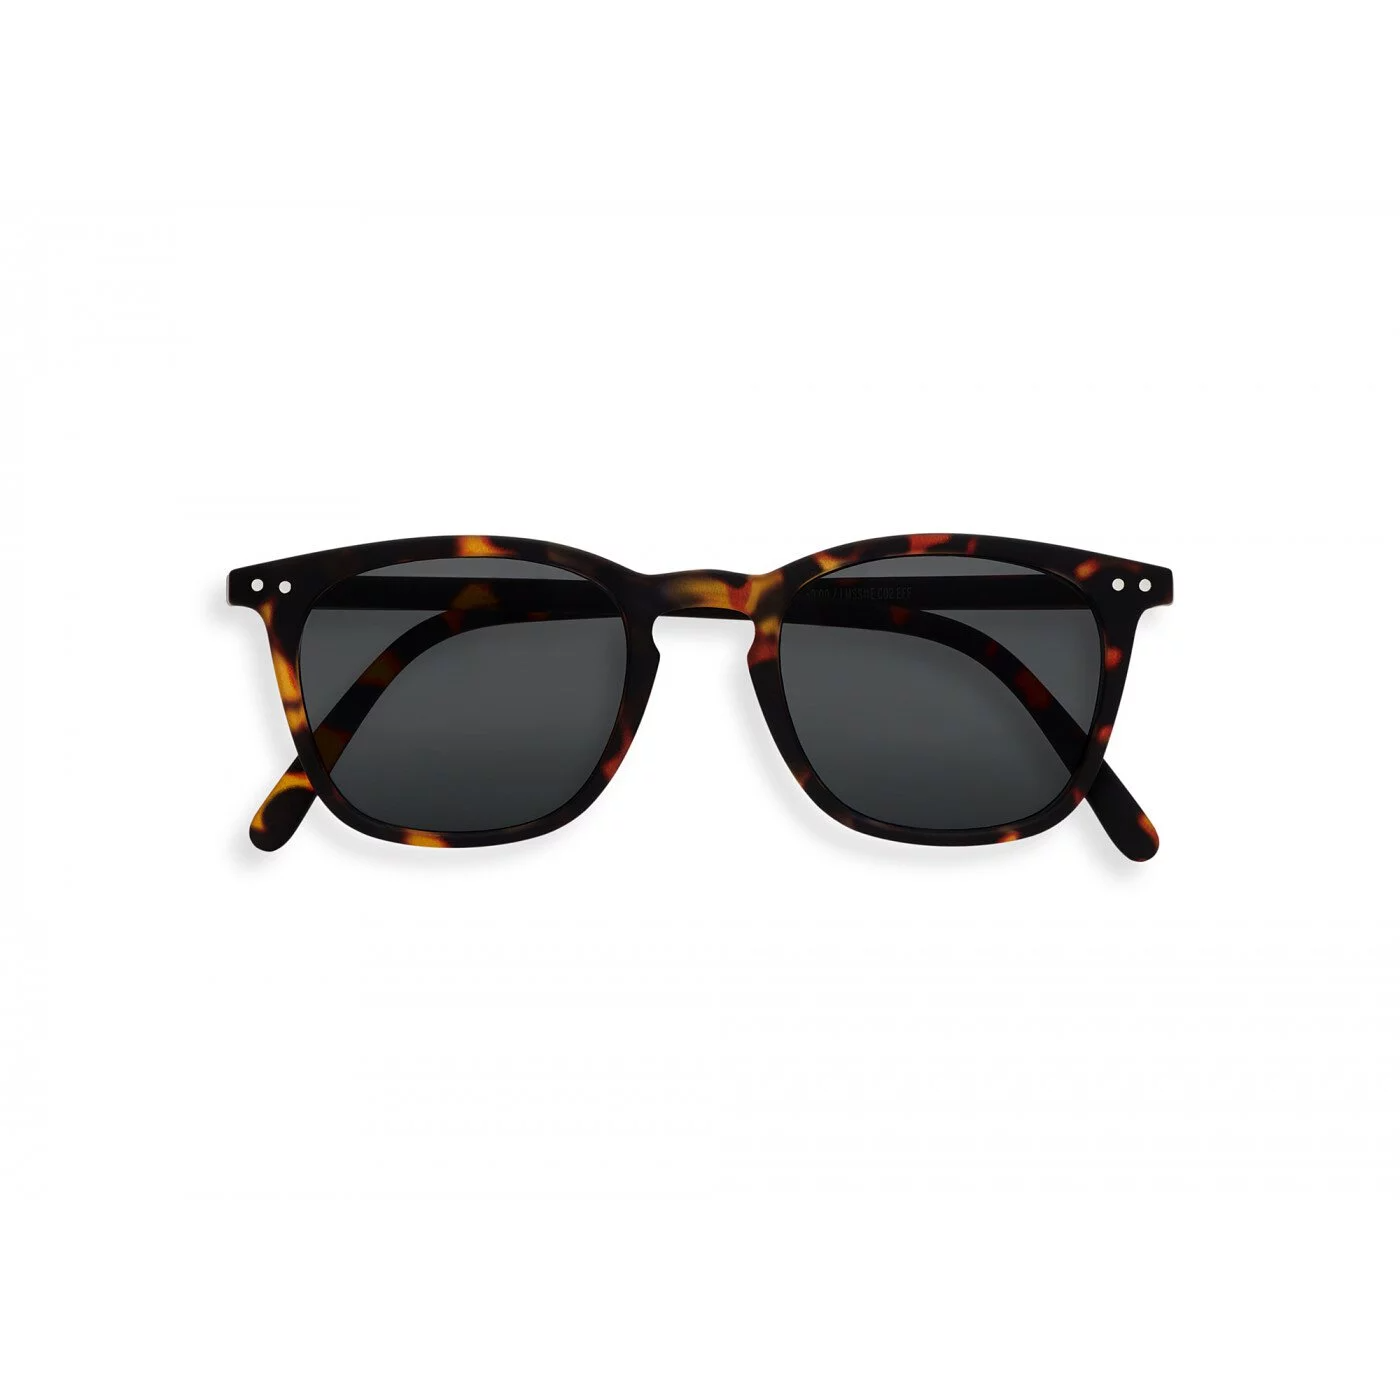 IZIPIZI   #E款 玳瑁/灰色鏡片 方框太陽眼鏡